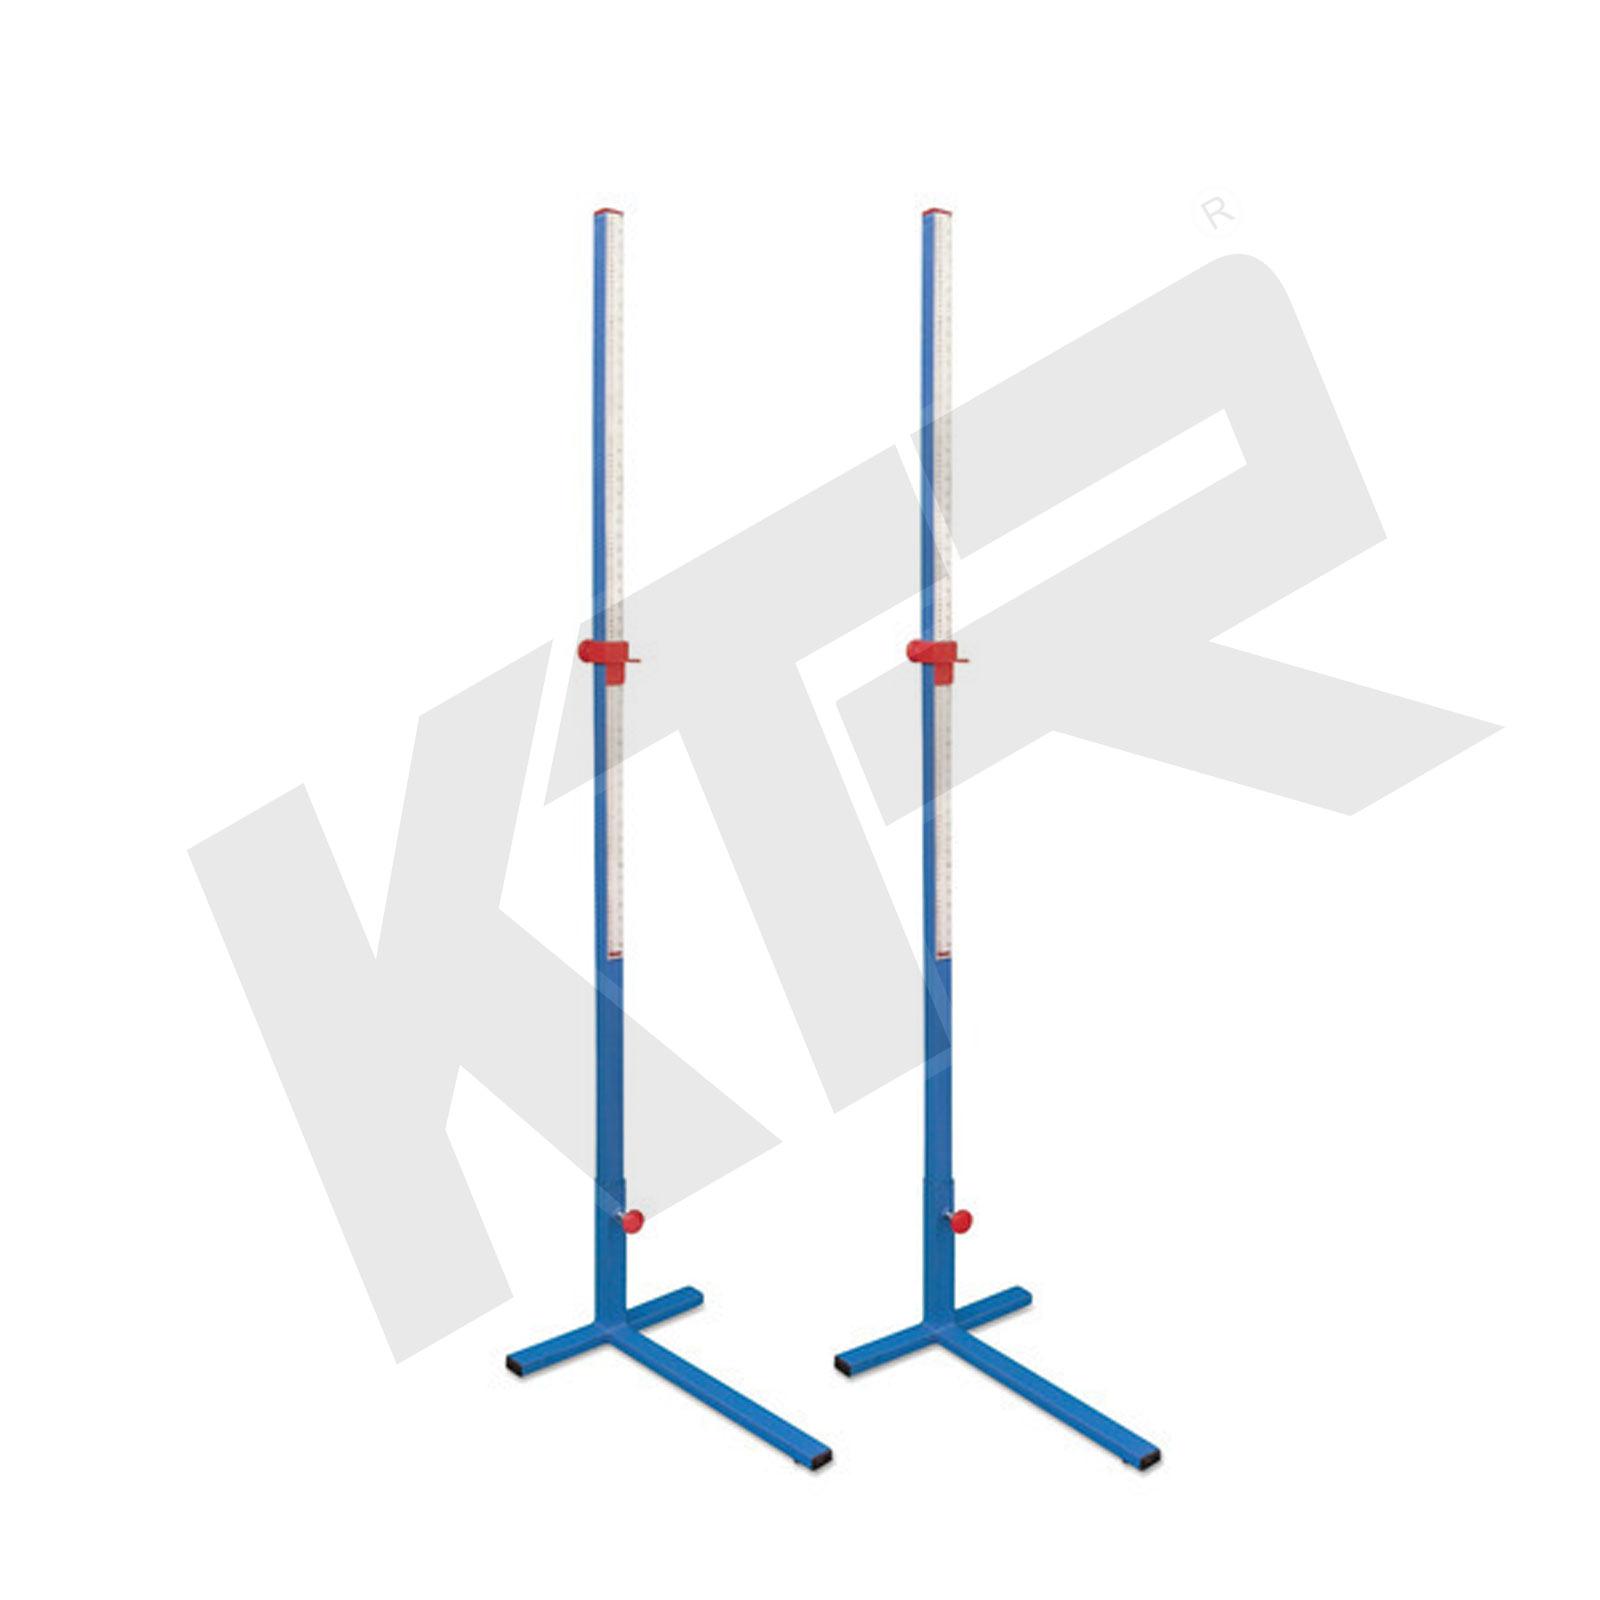 KTR Metco Pole Vault Pole Fiber 35/30 mm